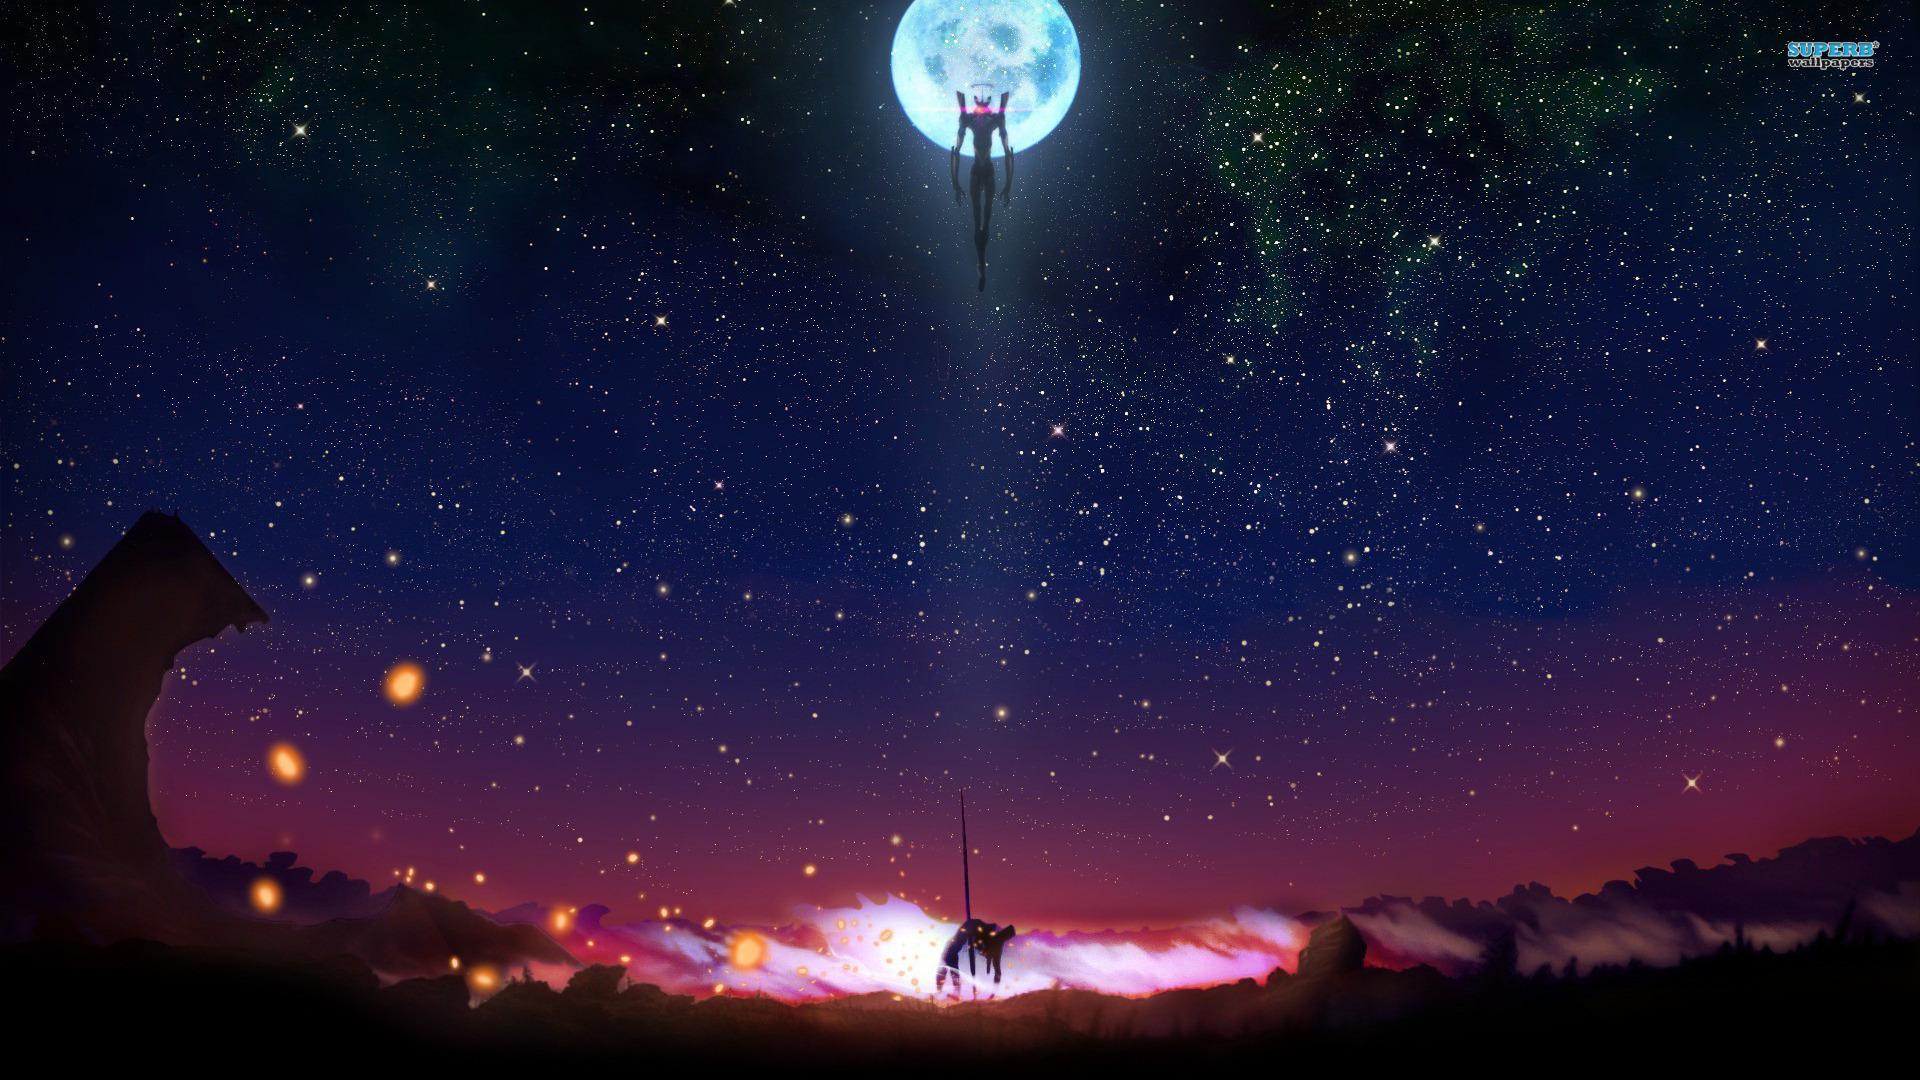 evangelion wallpaper hd anime - photo #6